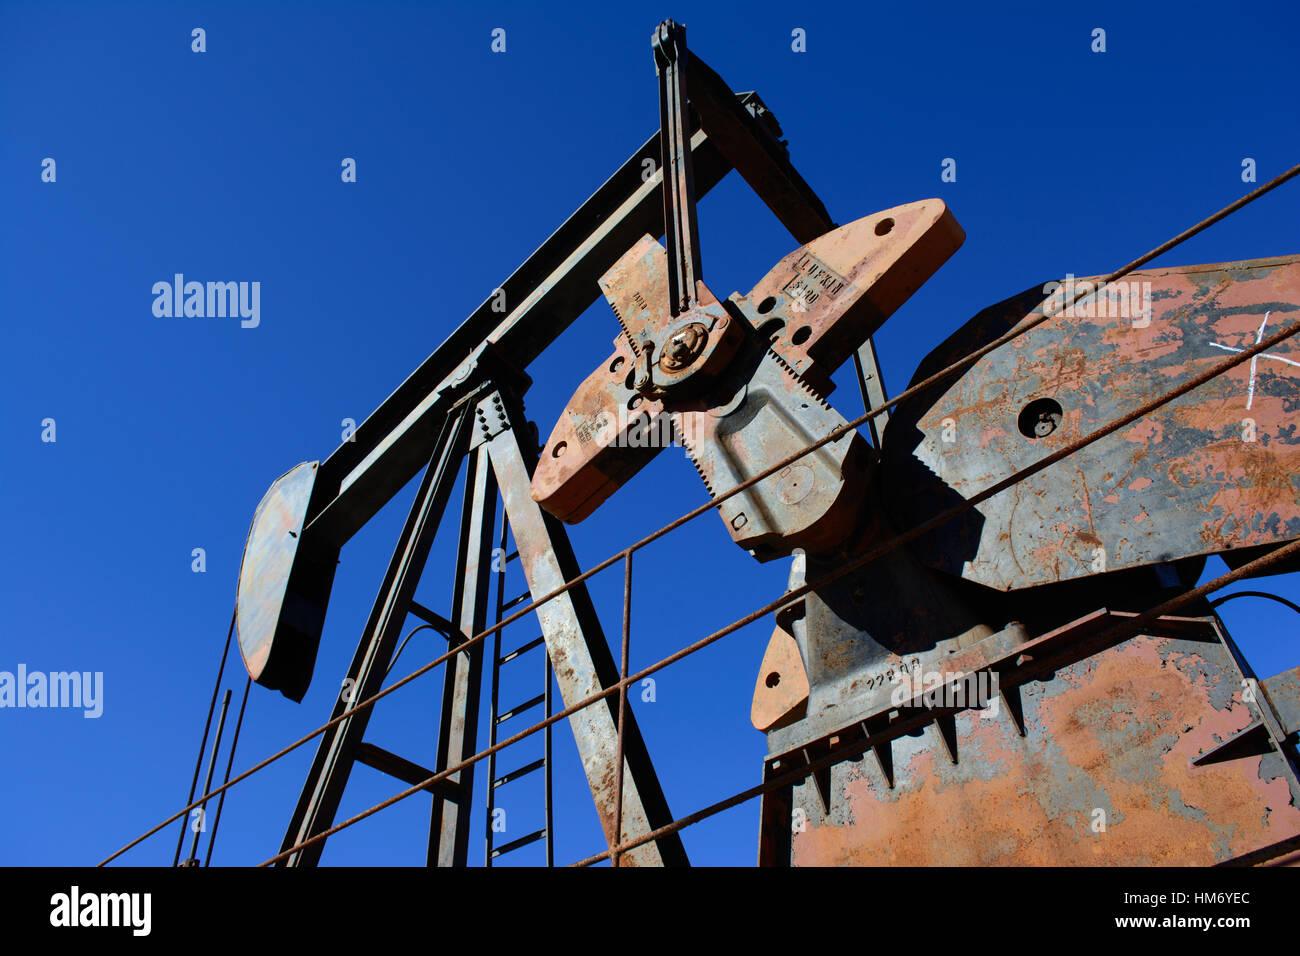 Rusty Oilfield Pumpjack (rocking horse) over a wellhead. Clear blue sky background. Illustrates oilfield life, petroleum - Stock Image